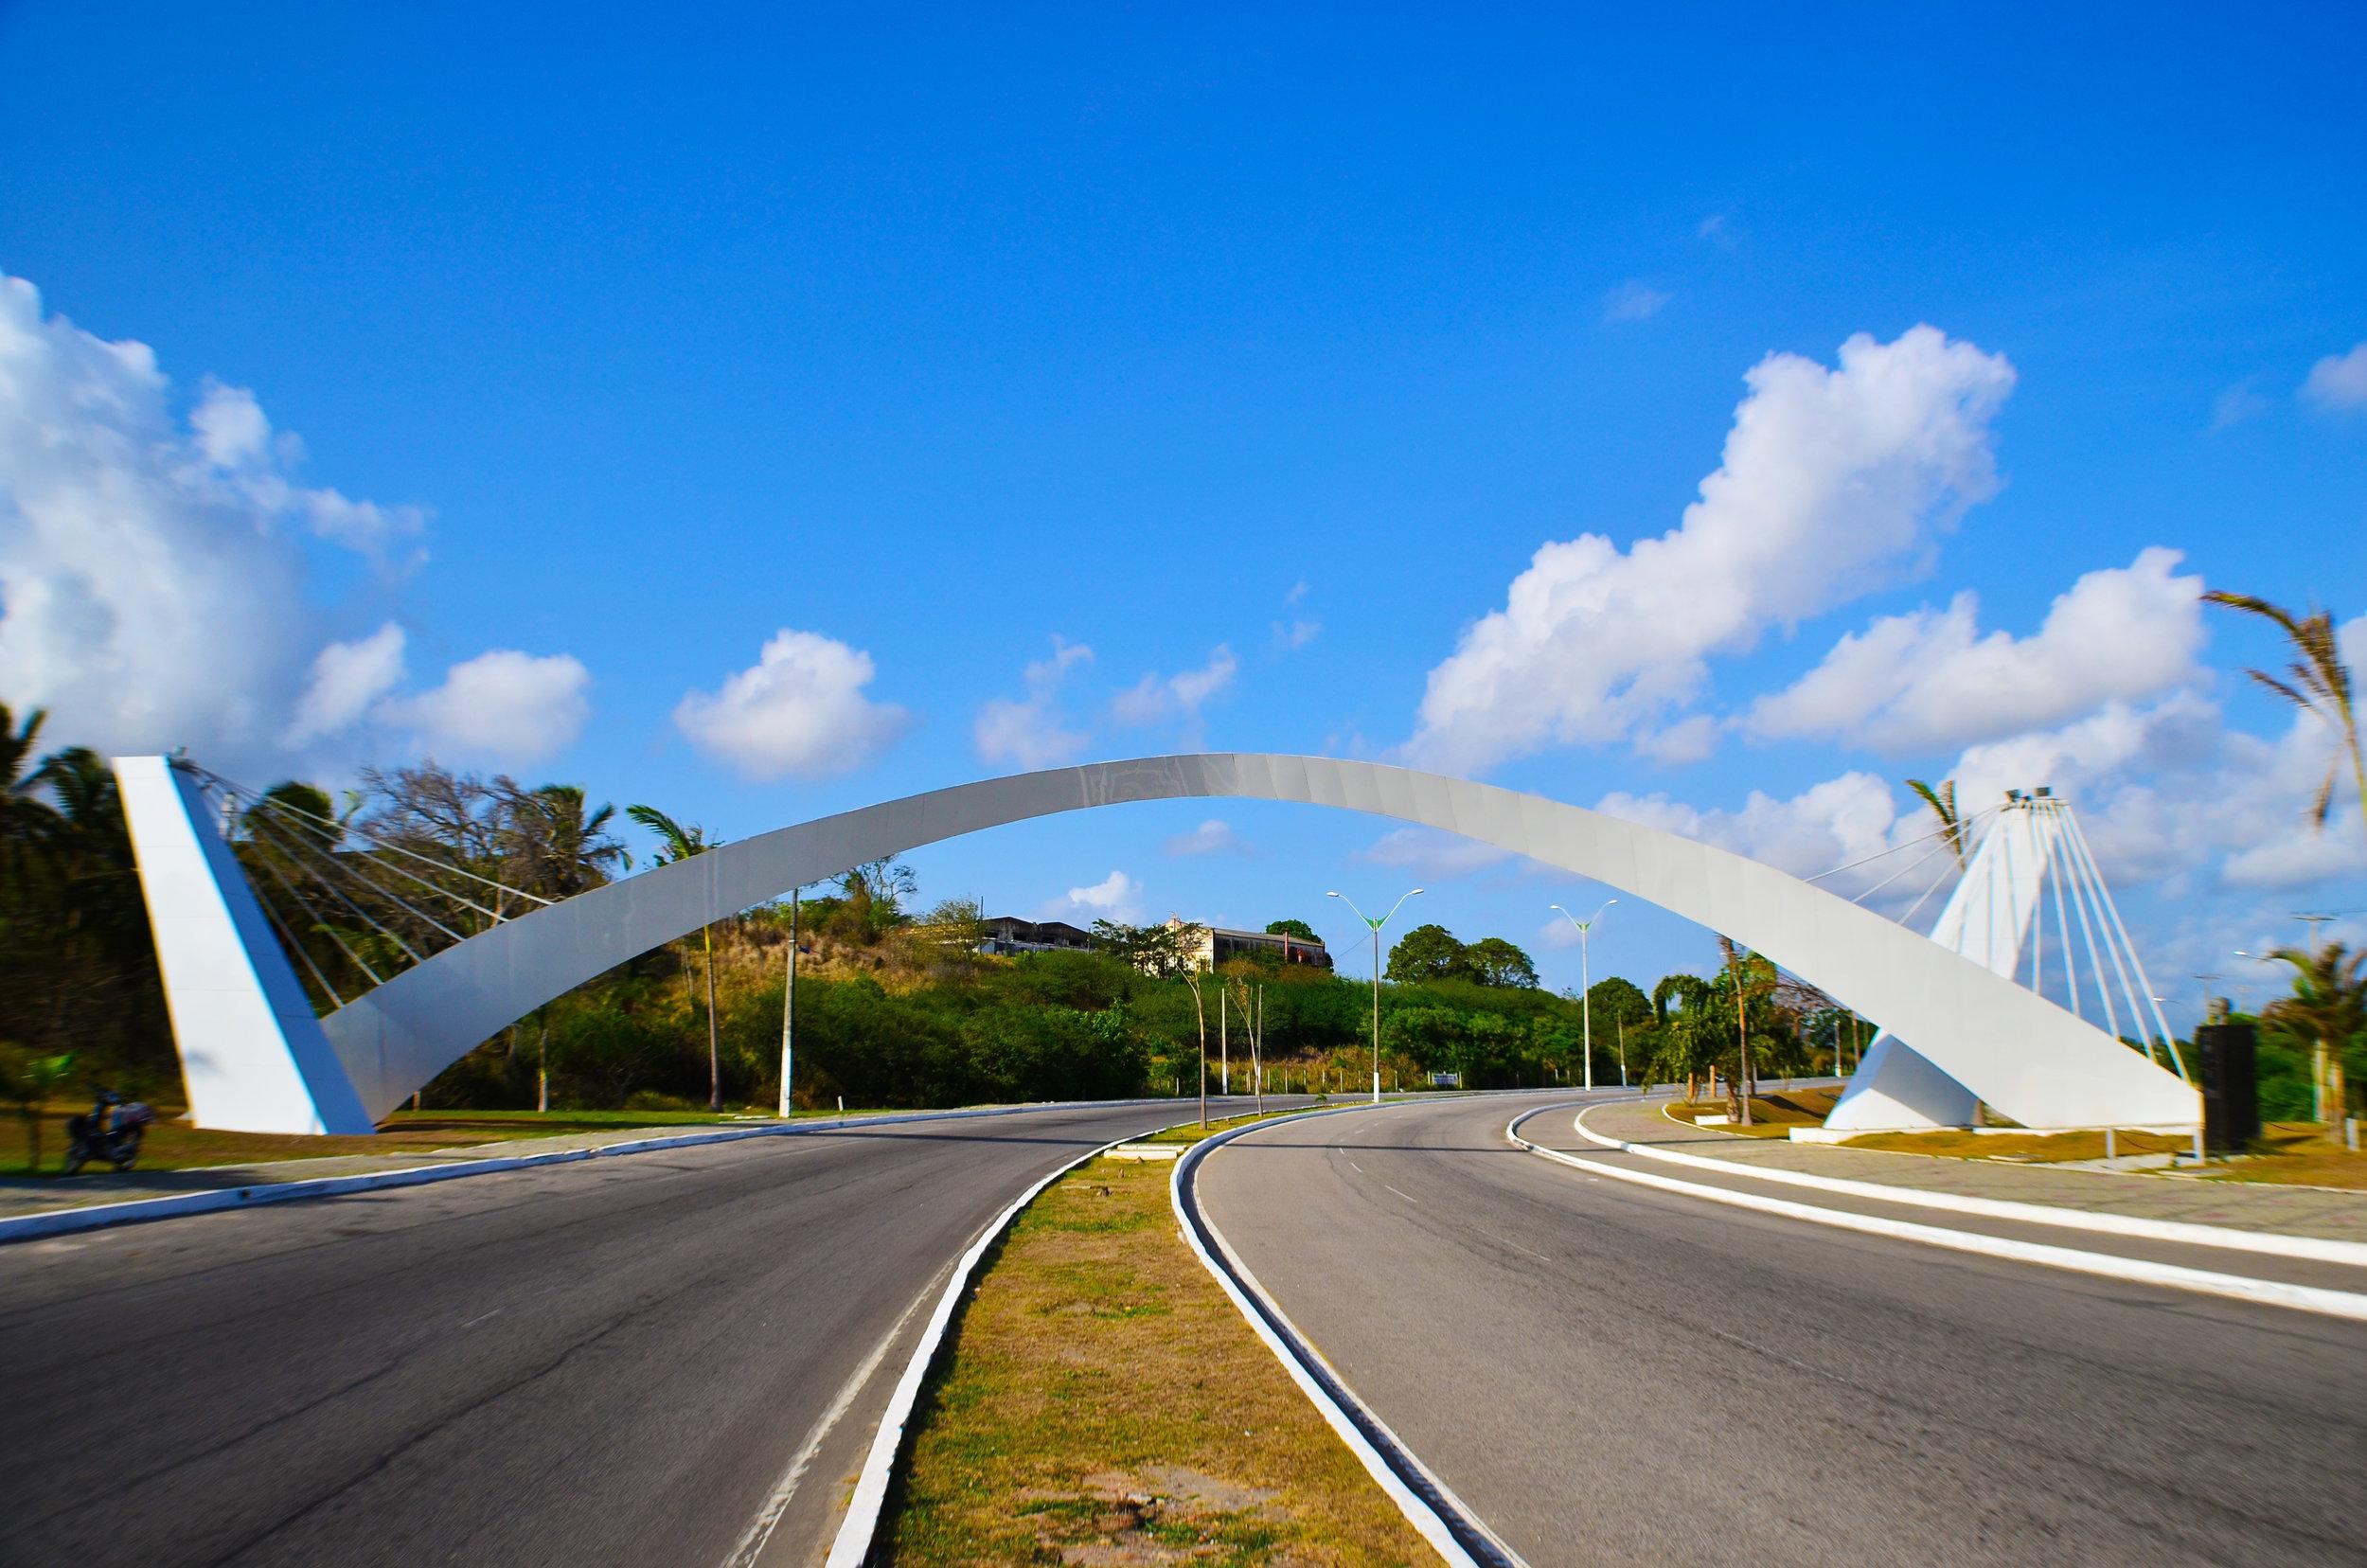 projeto-arquitetonico-portmacaiba-duo-arquitetura-urbanistico-06.jpg